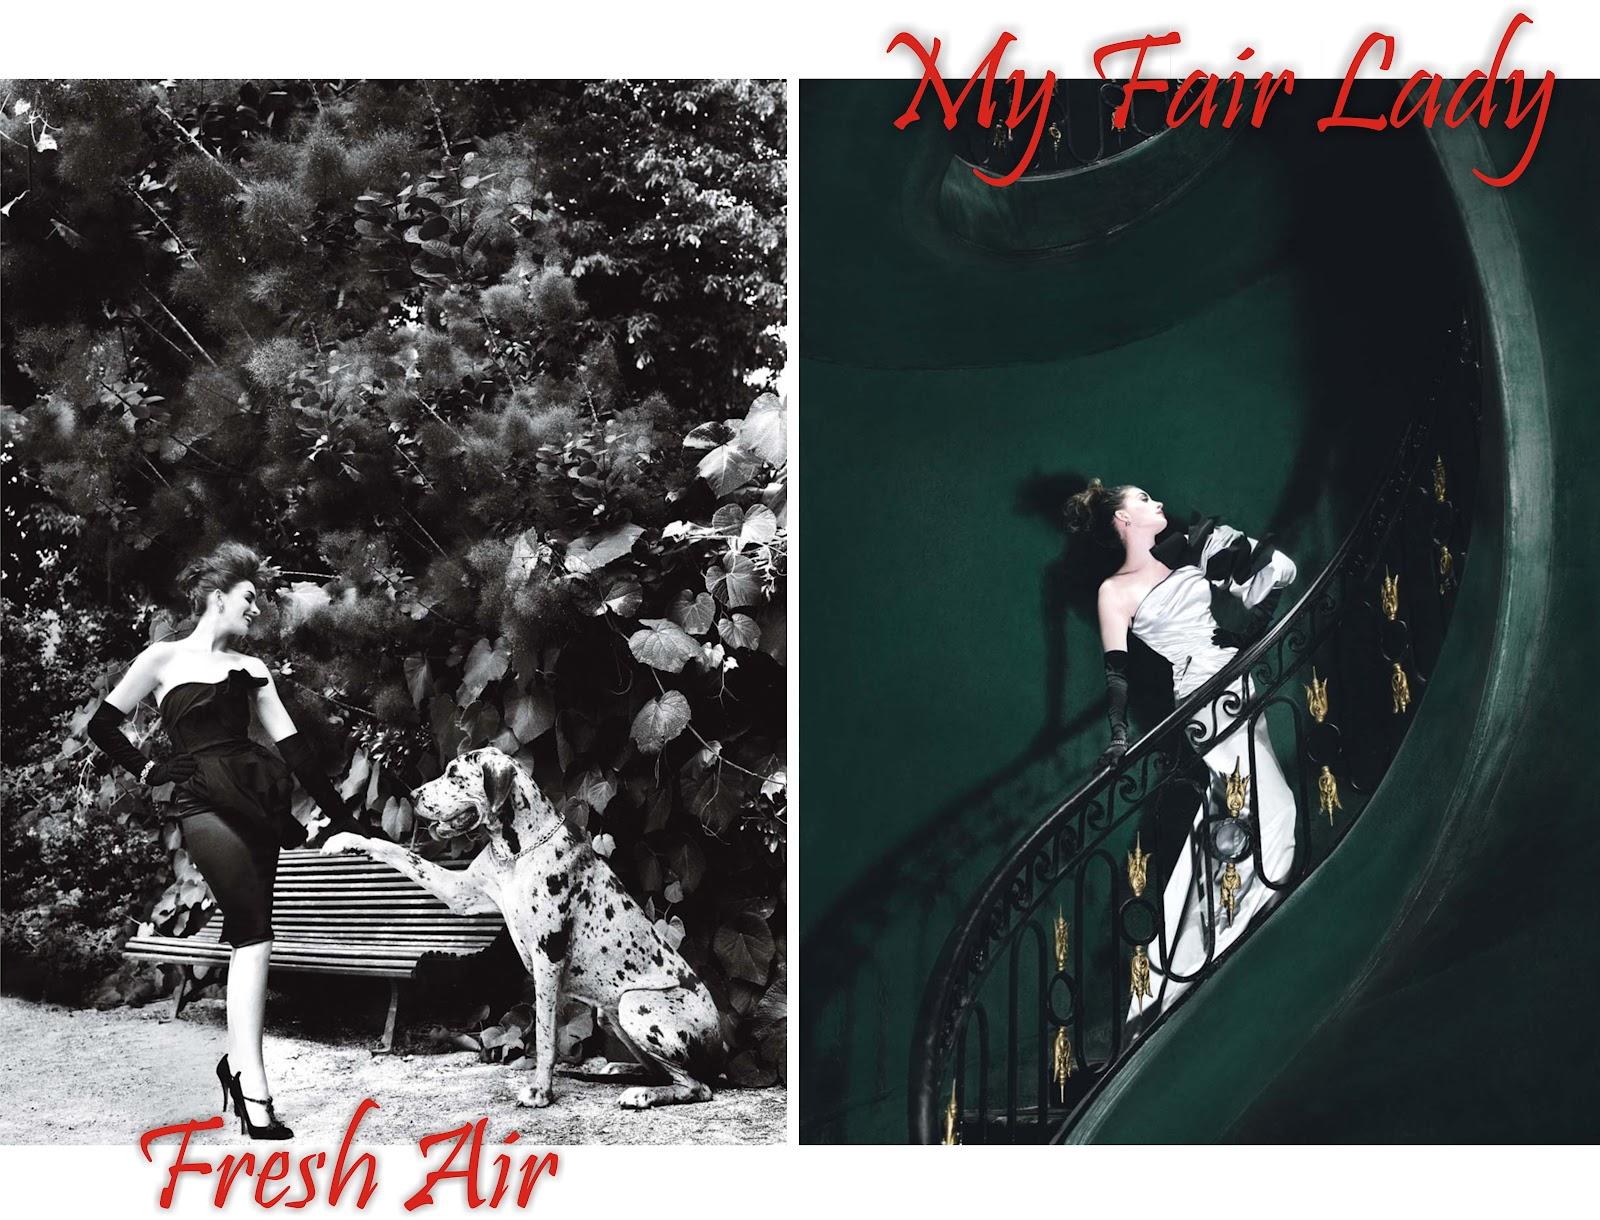 http://3.bp.blogspot.com/-YH7Nd-9TqoI/UAN3ojVoWHI/AAAAAAAADMQ/Zi1olSxZbp0/s1600/VOGUE+Anne+Hathaway+3.jpg